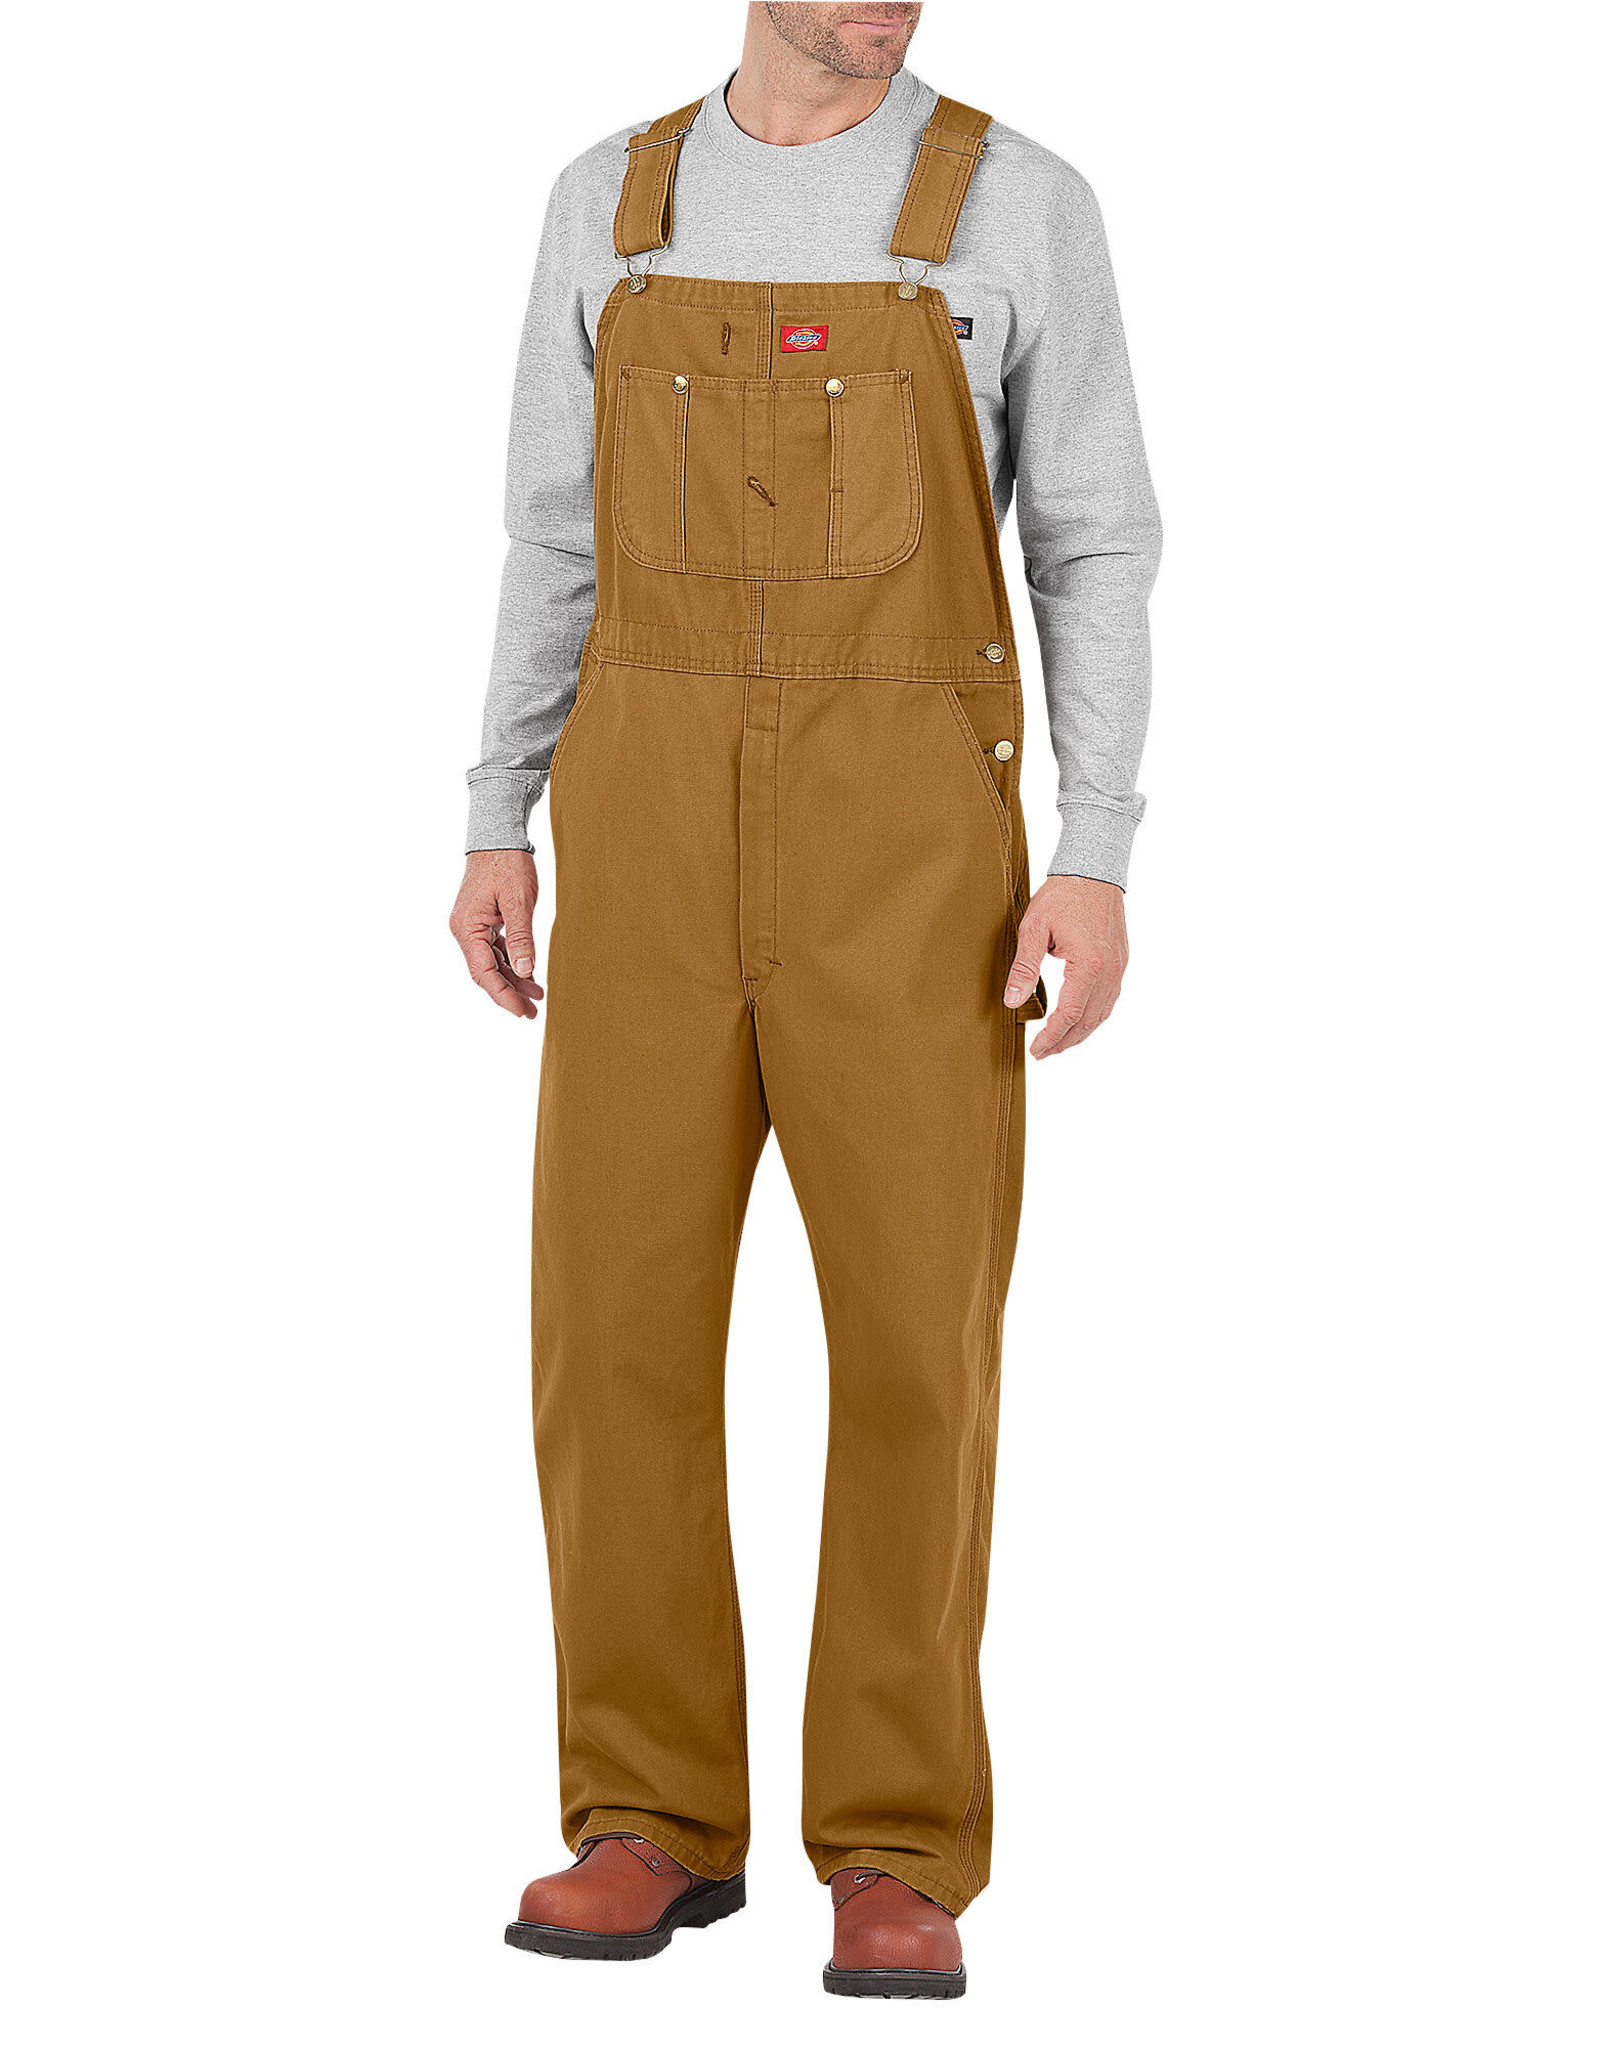 Dickies Duck Bib Overall - Brown